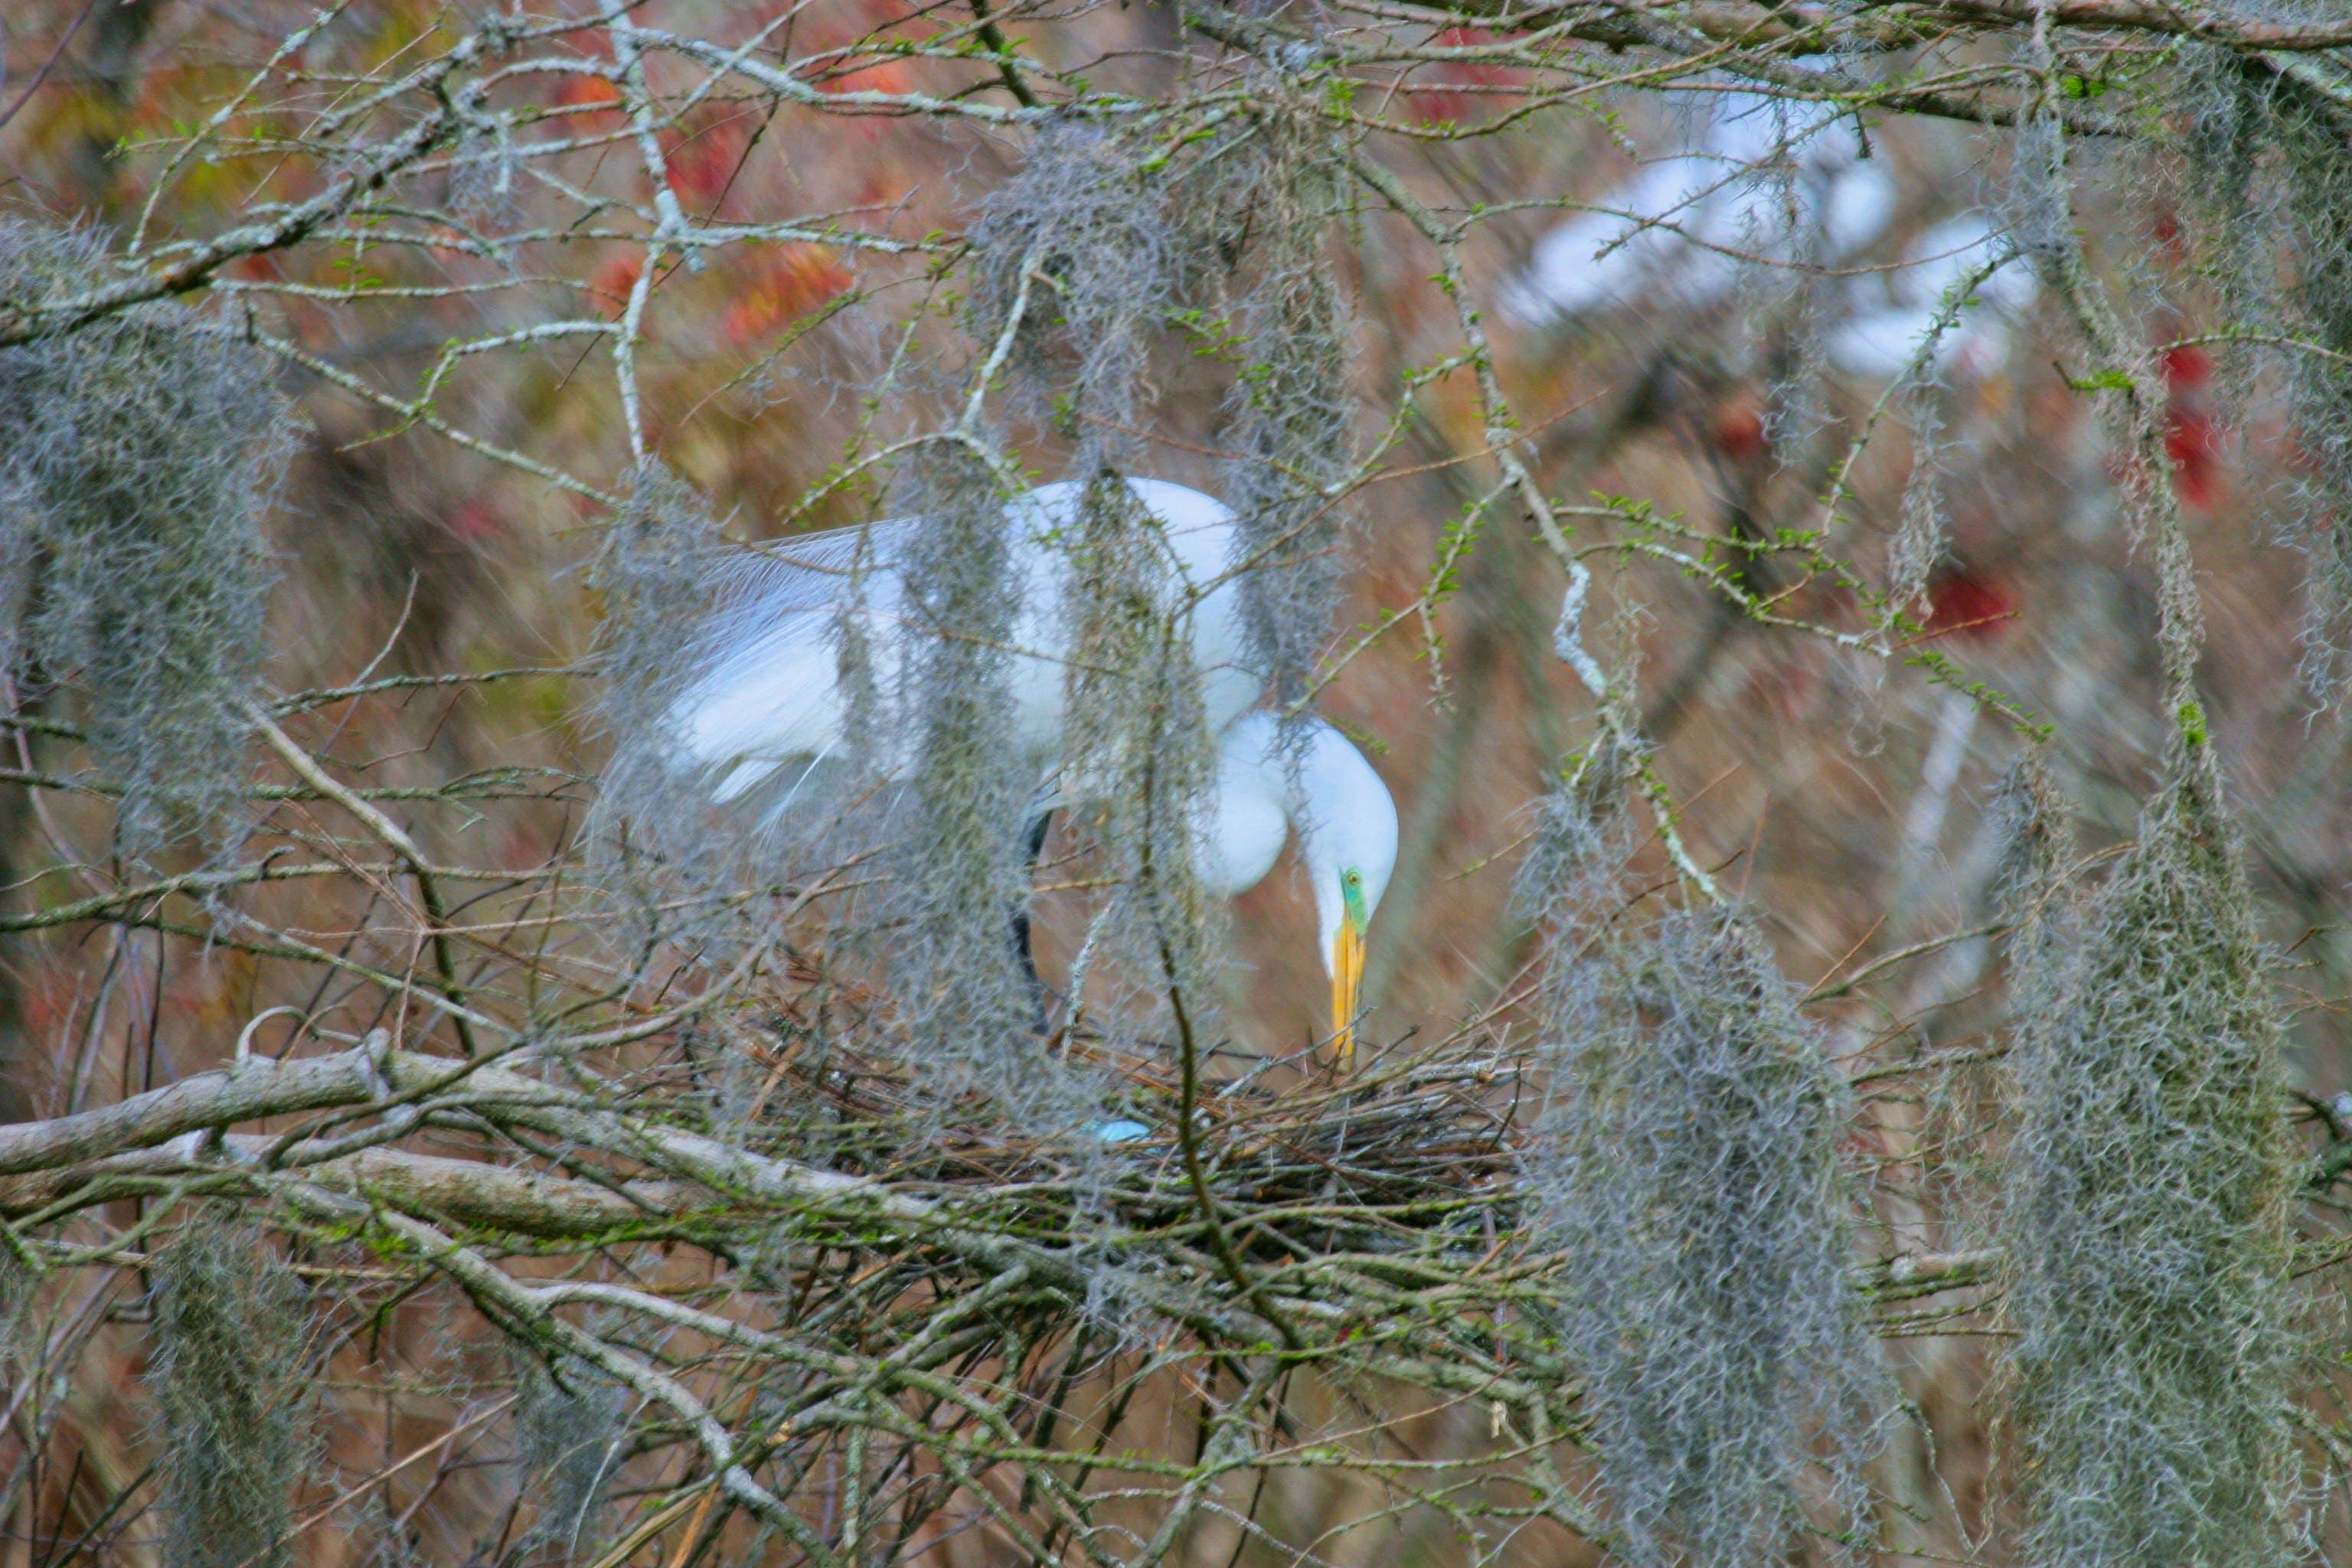 Focus Photo of White Bird on Nest